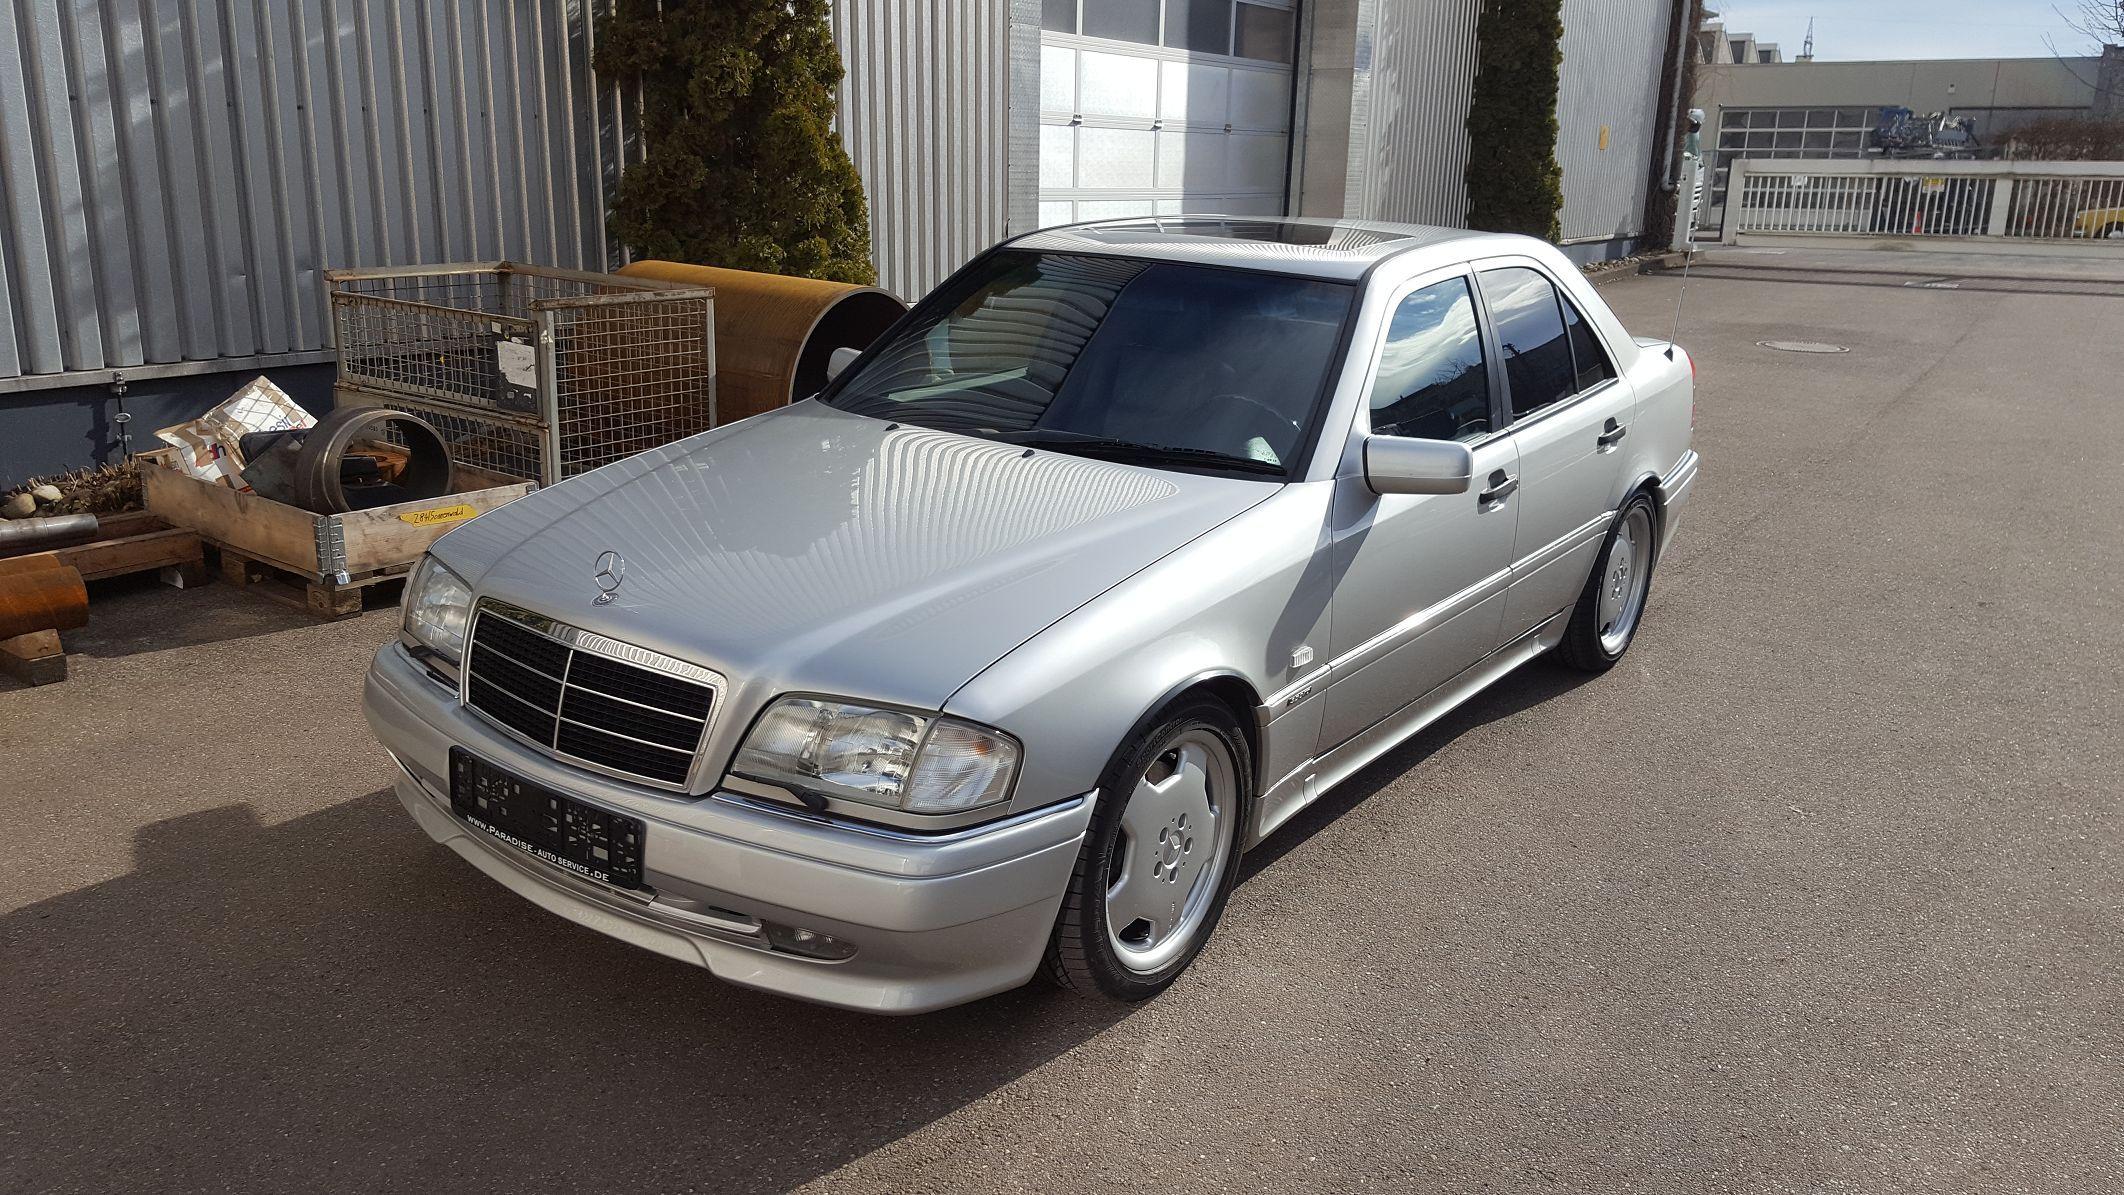 Mercedes W202 C36 AMG (206 KW/ 280 PS)